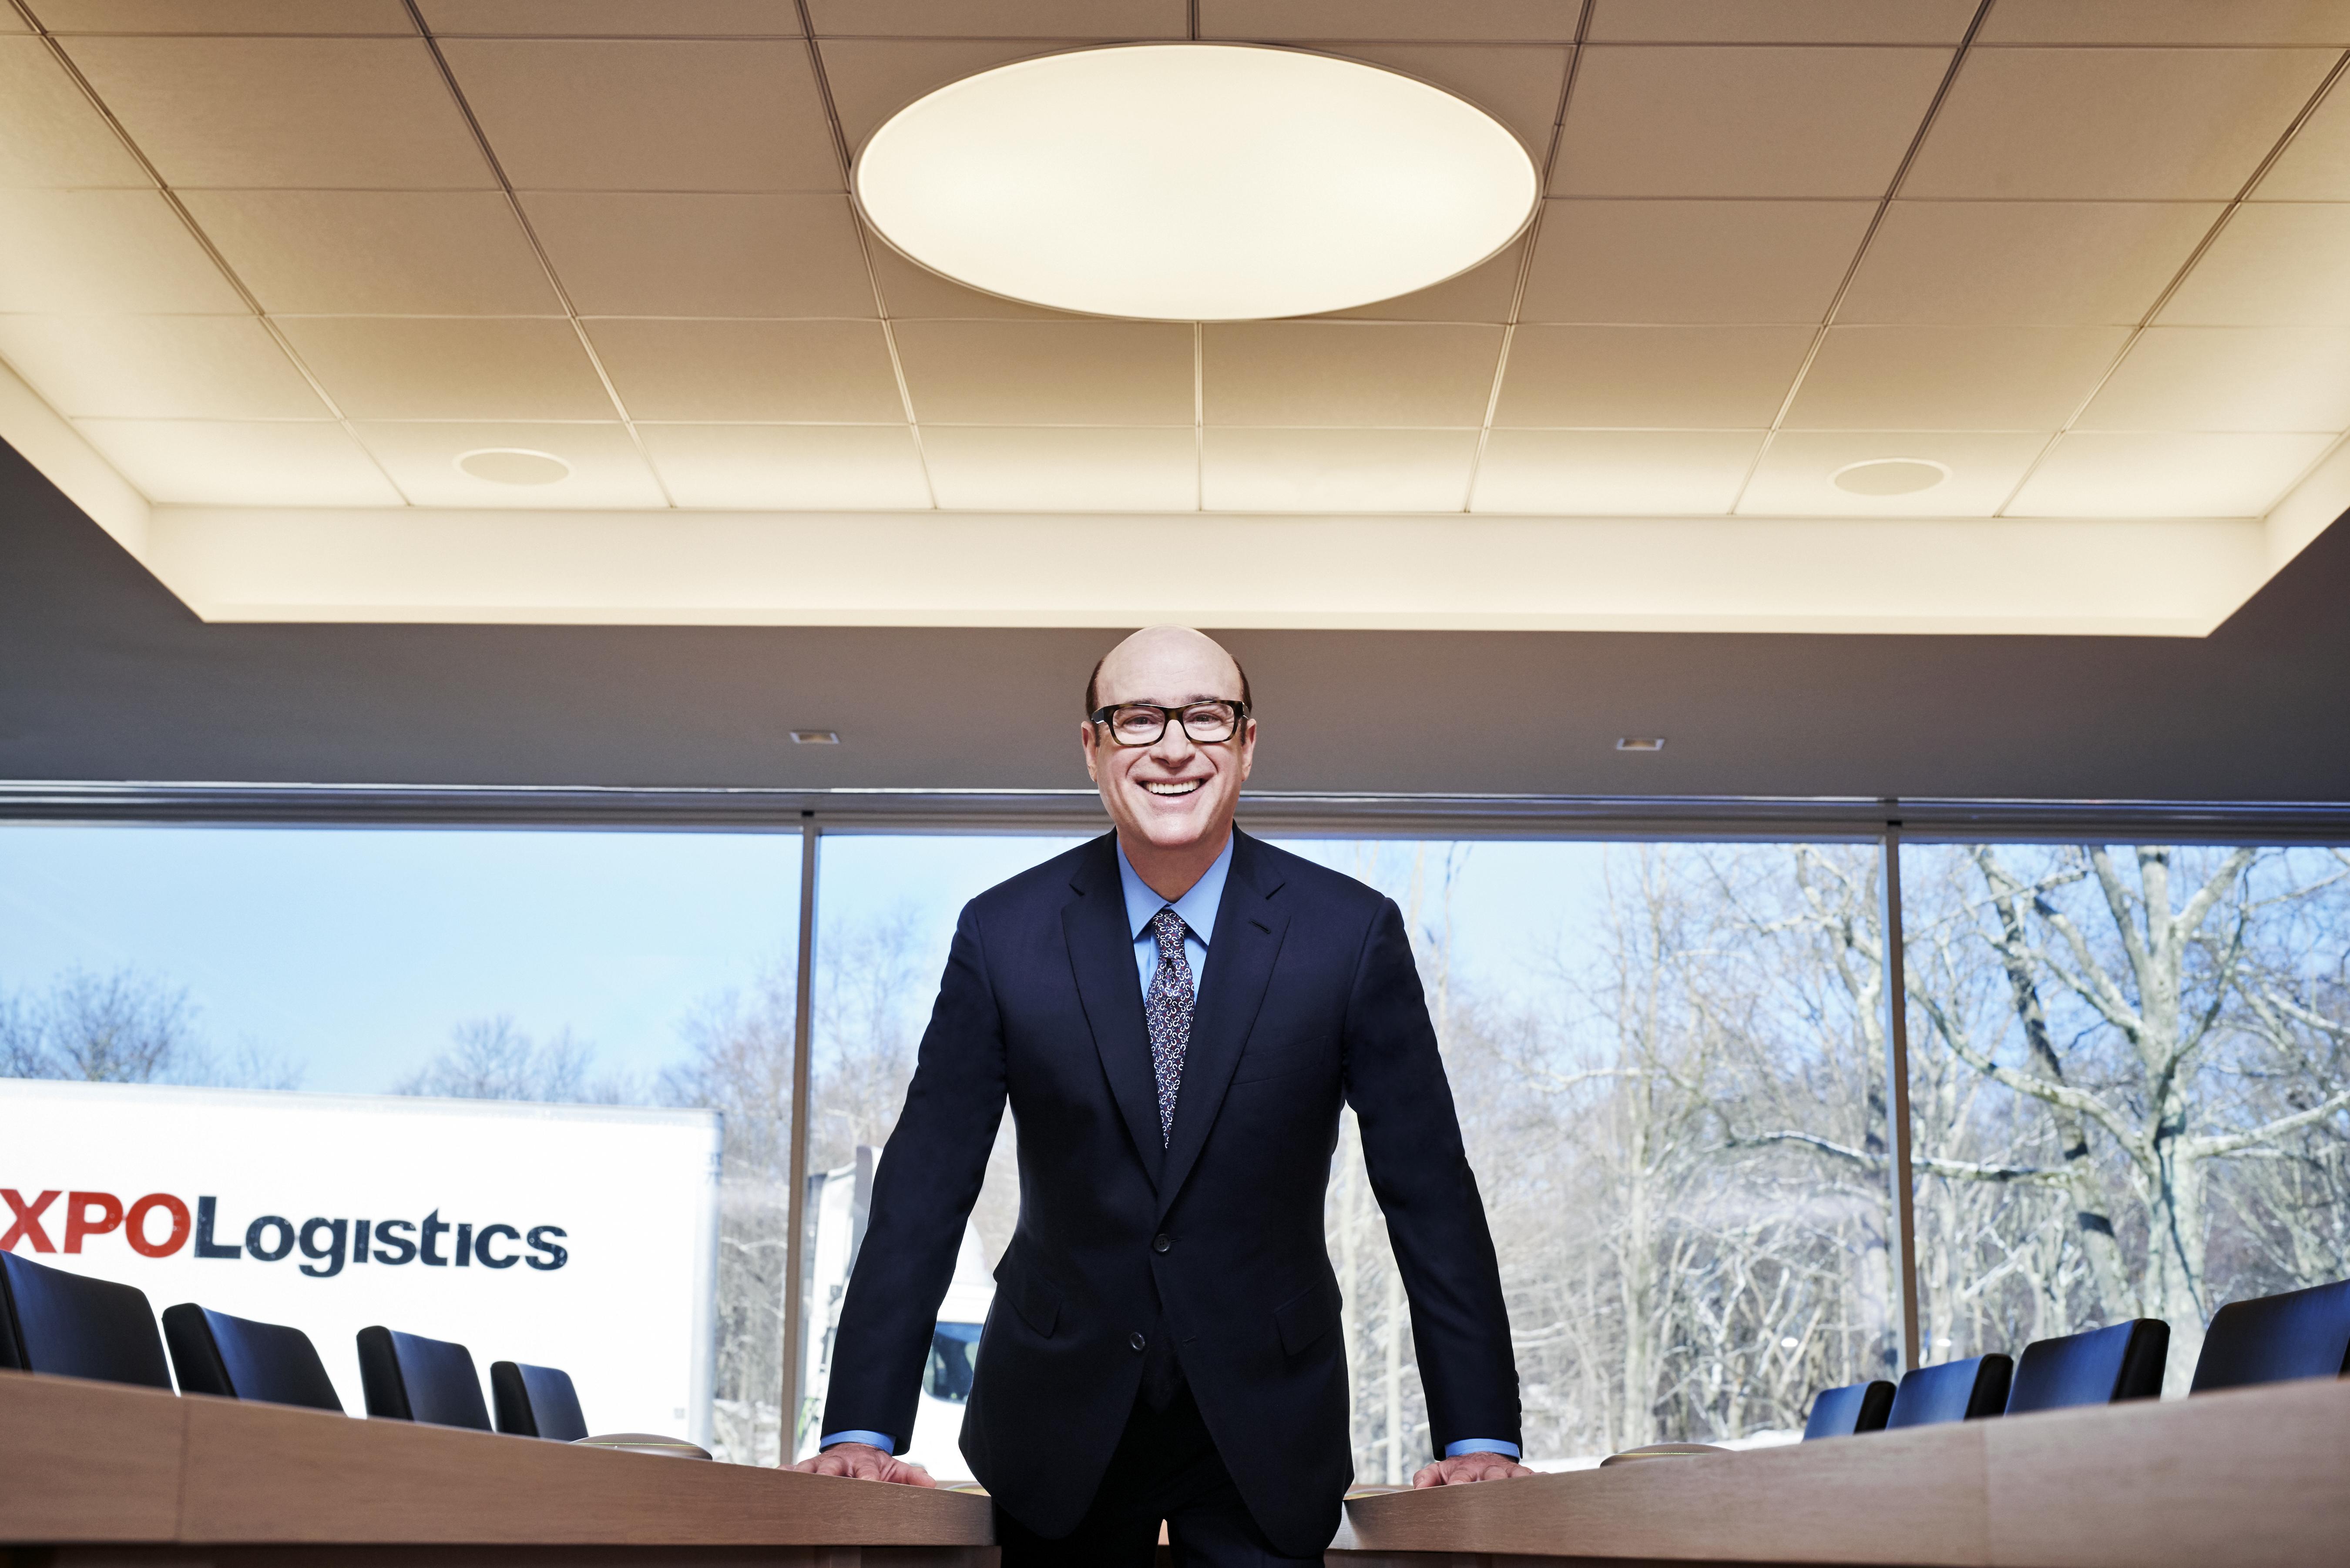 XPO Logistics President and CEO Bradley Jacobs